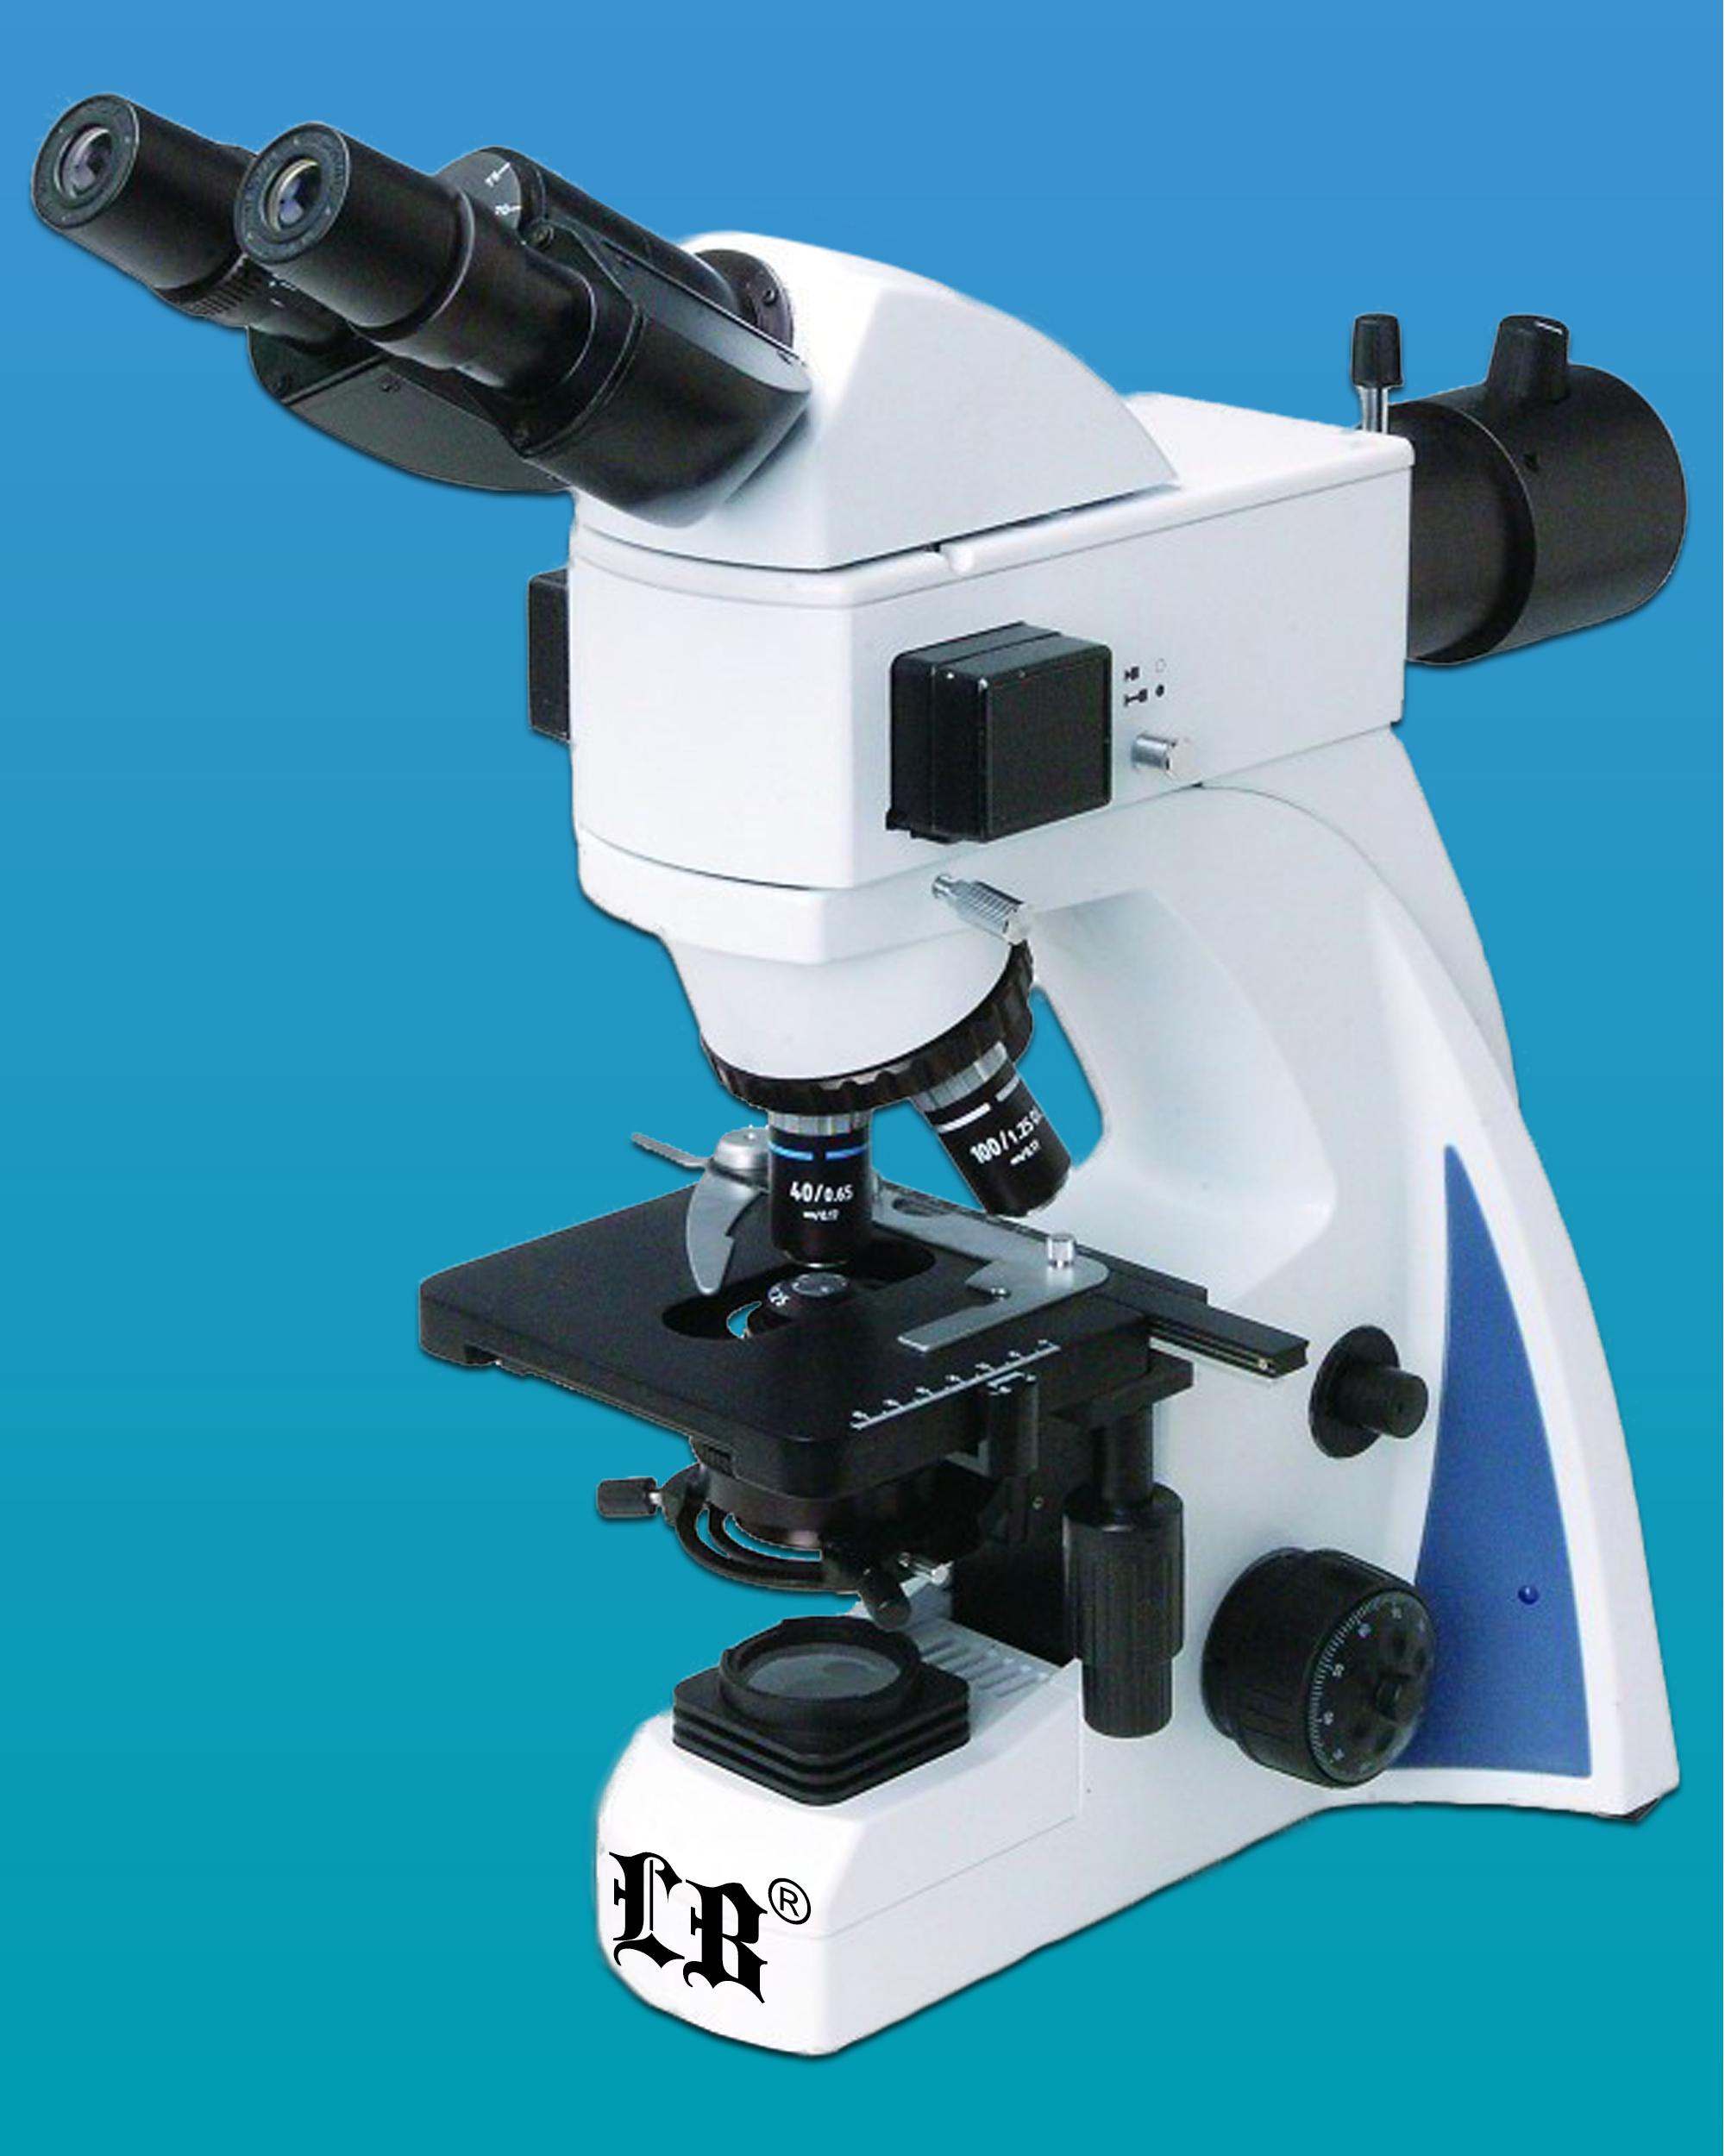 [LB-244] Binocular LED Fluorescent Biological Microscope w/ Epi-Fluorescent Attachment